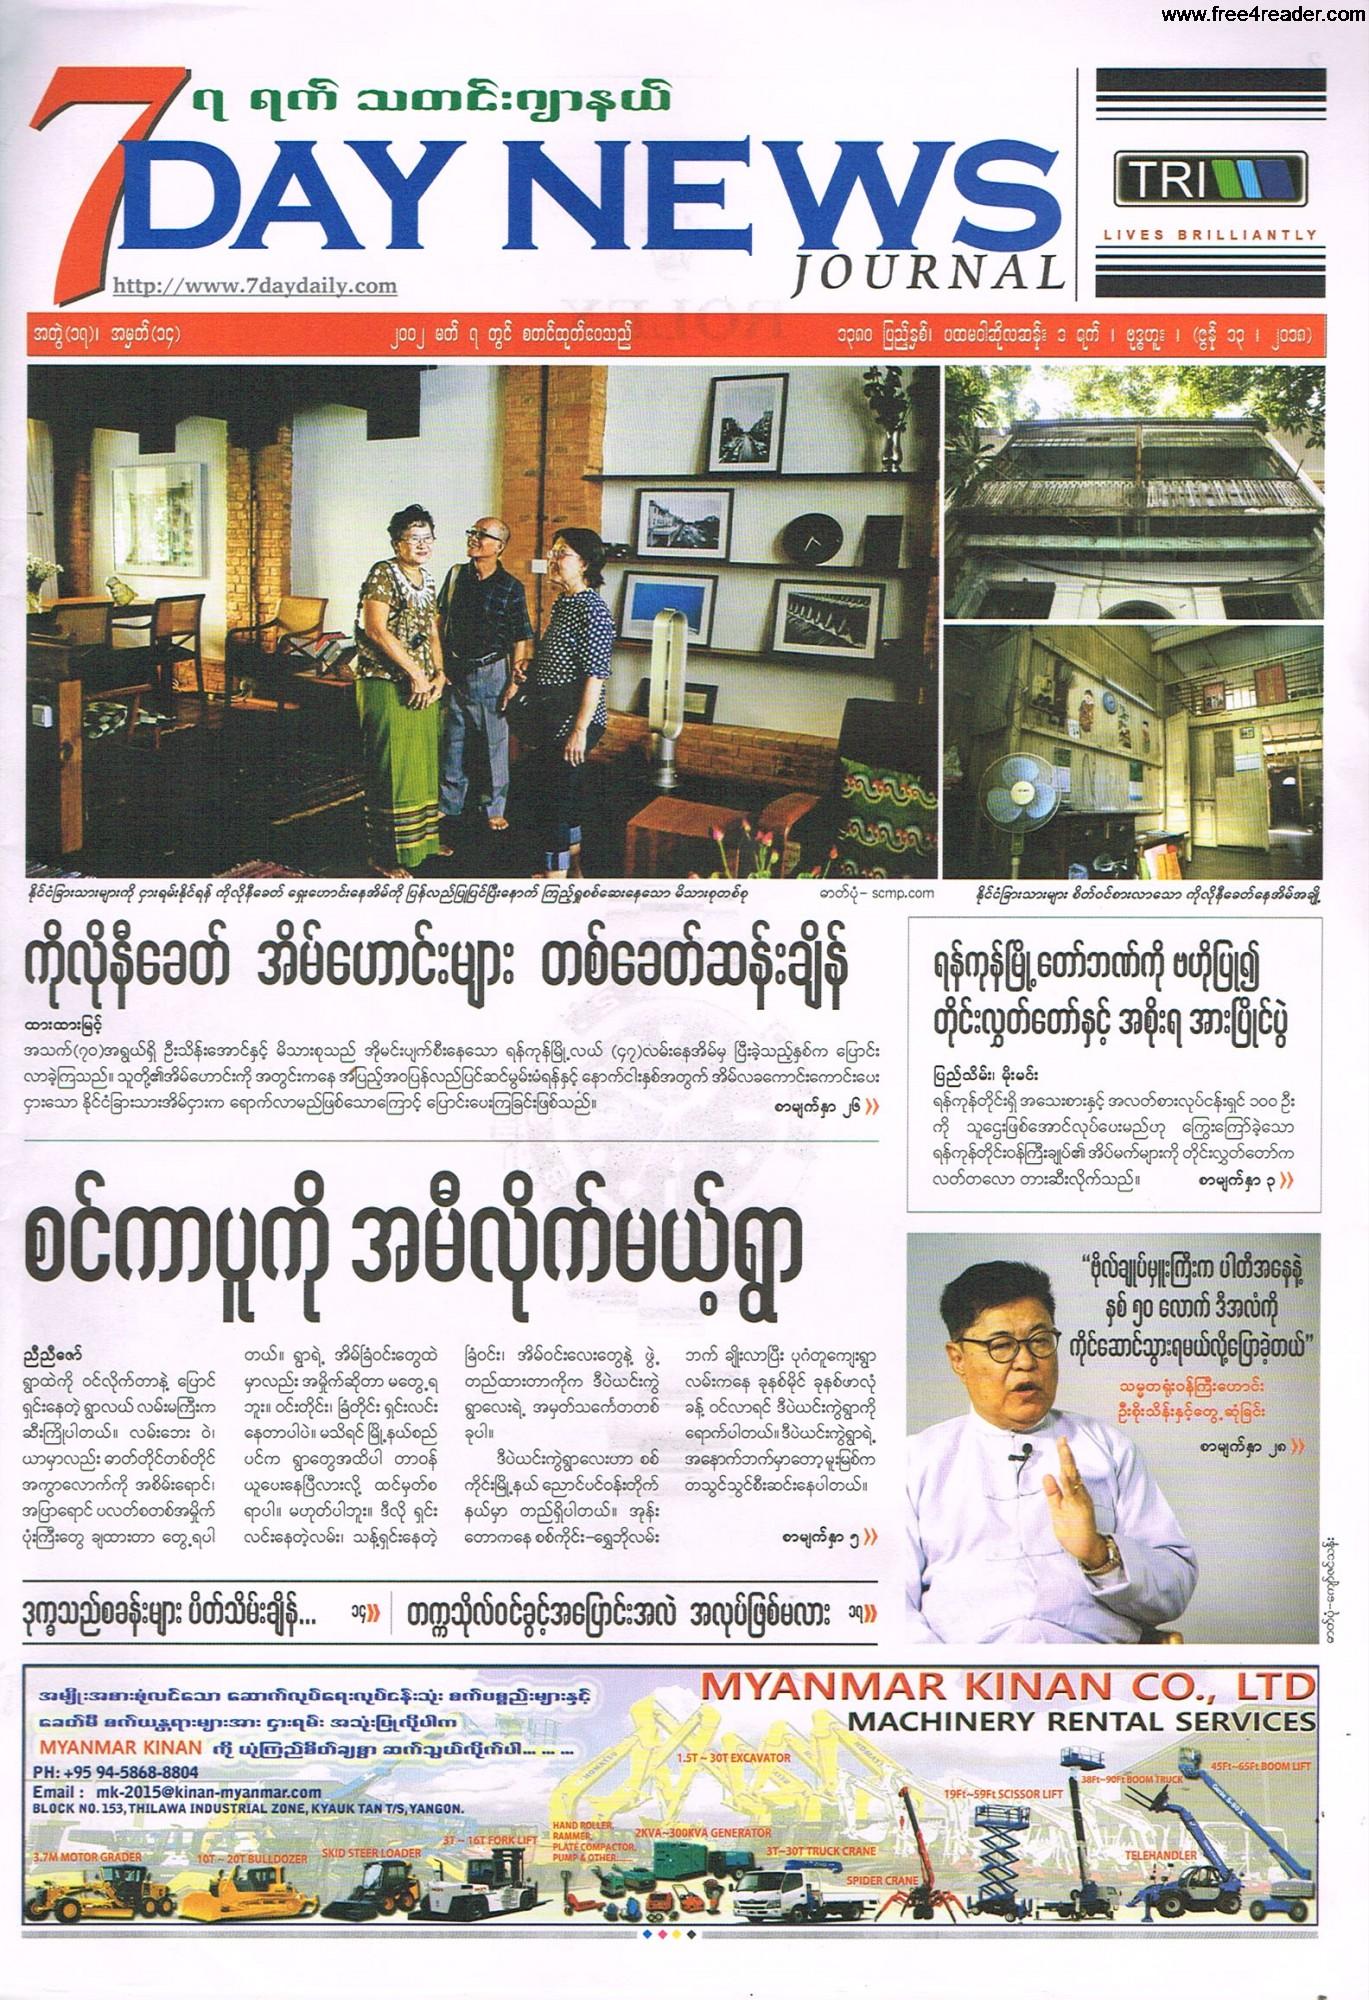 7 day news journal myanmar